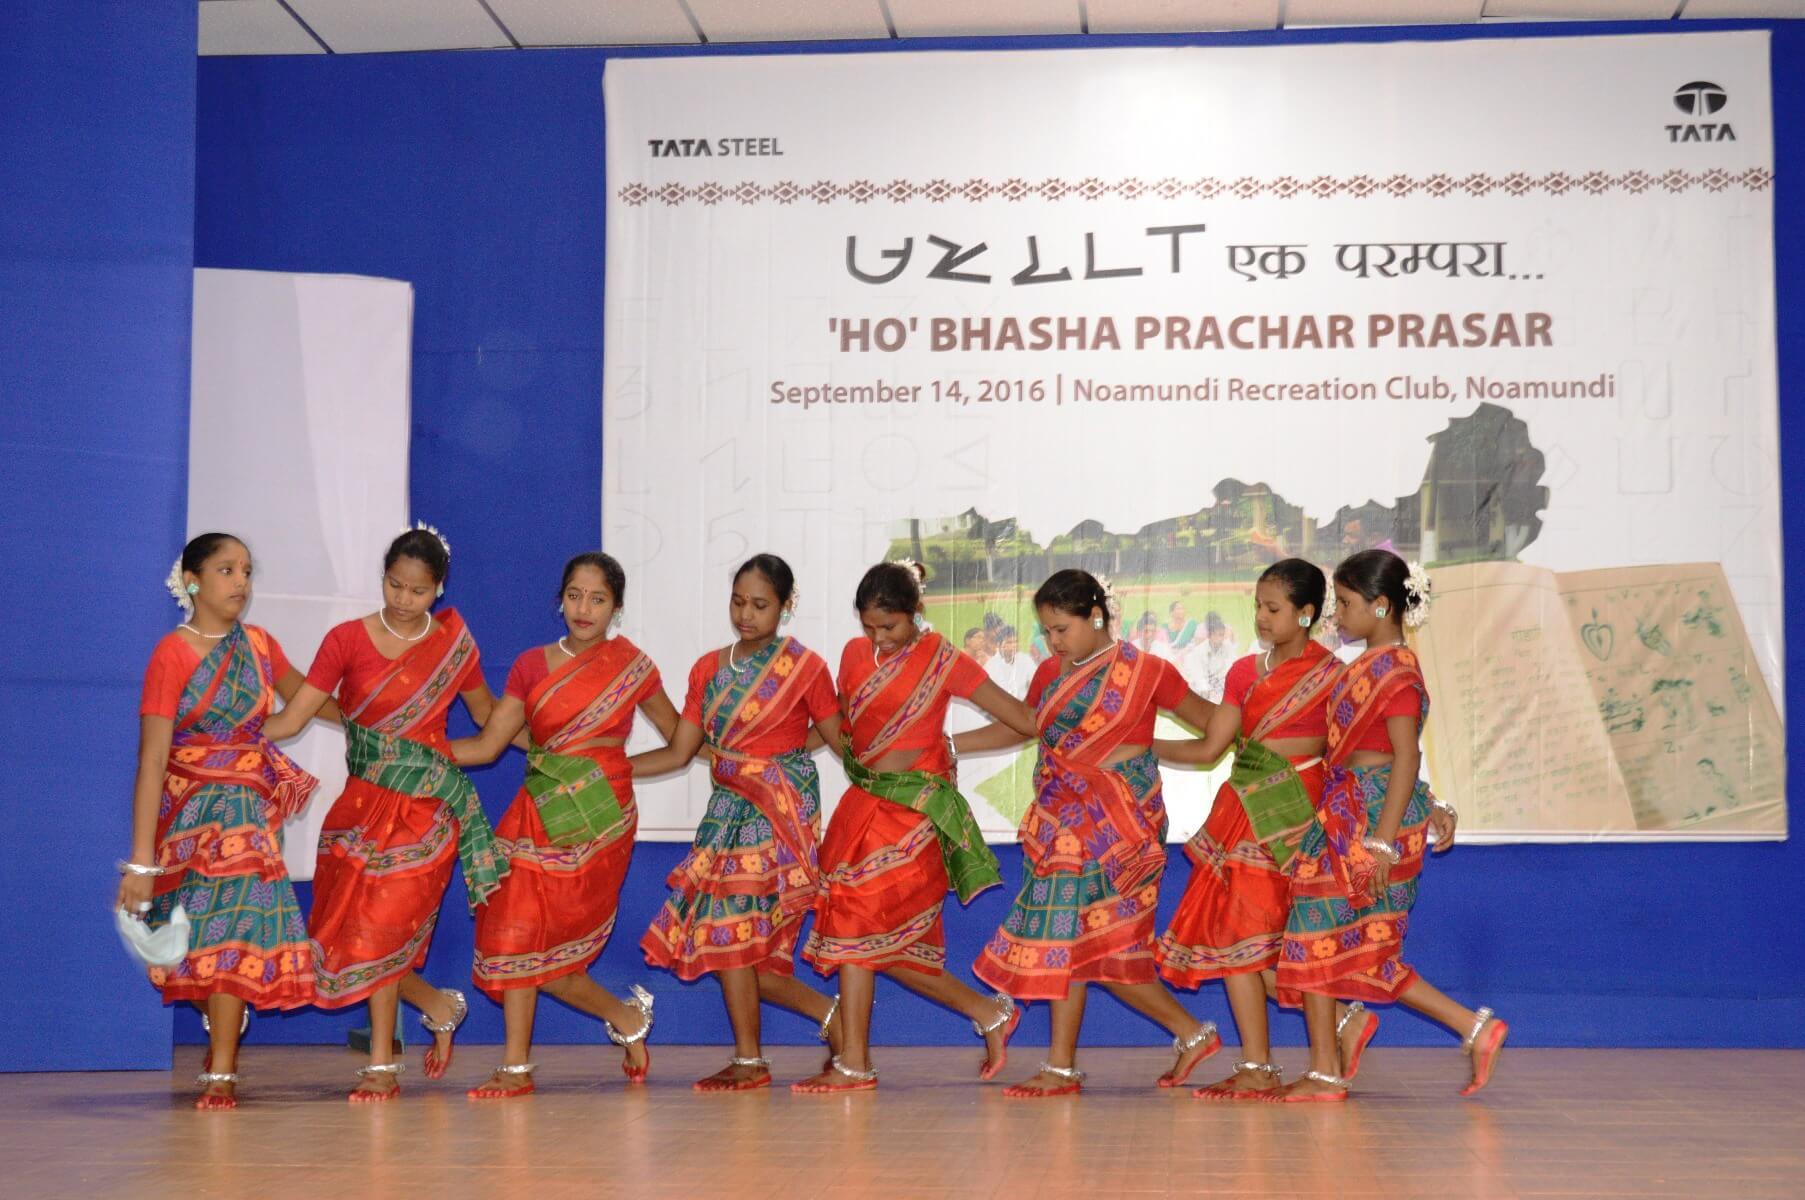 Tata Steel organizes a programme at Noamundi to preserve and